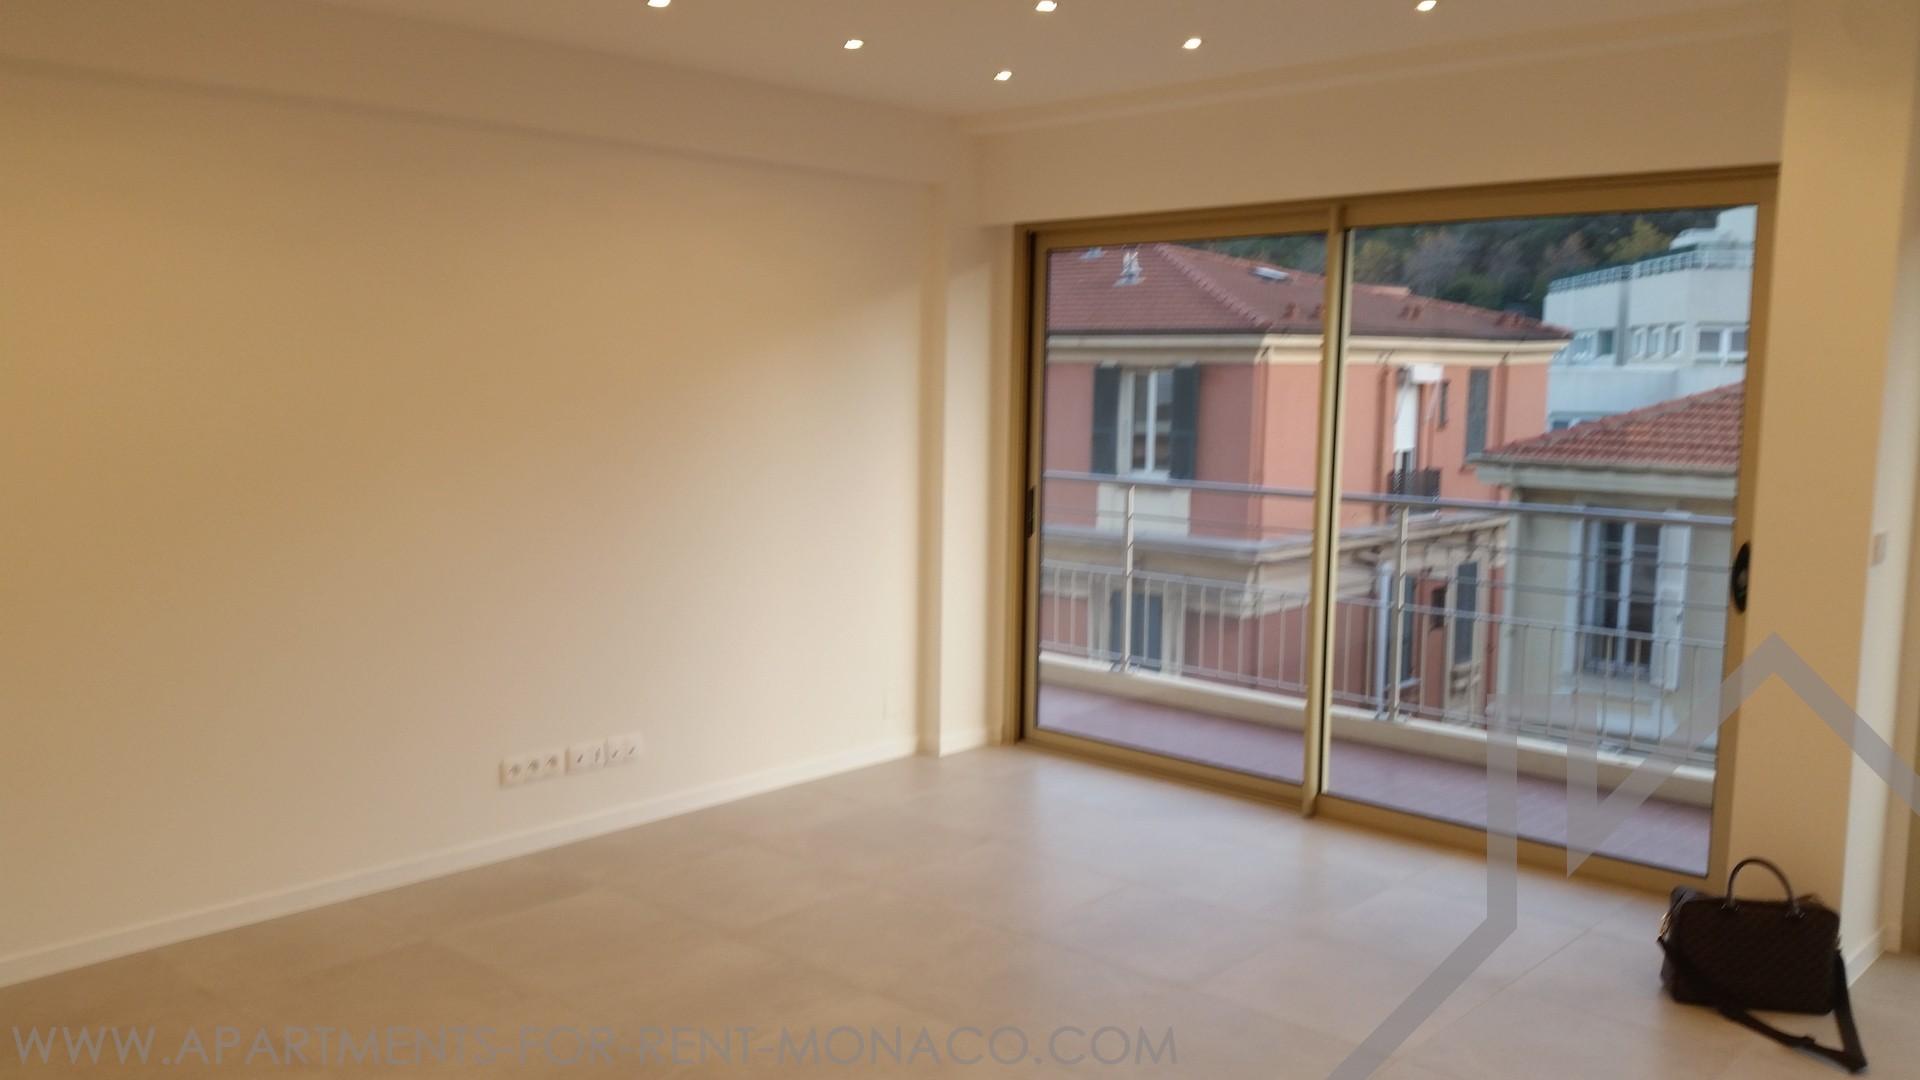 2 Bedroom Apartment In La Condamine Port Apartments For Rent